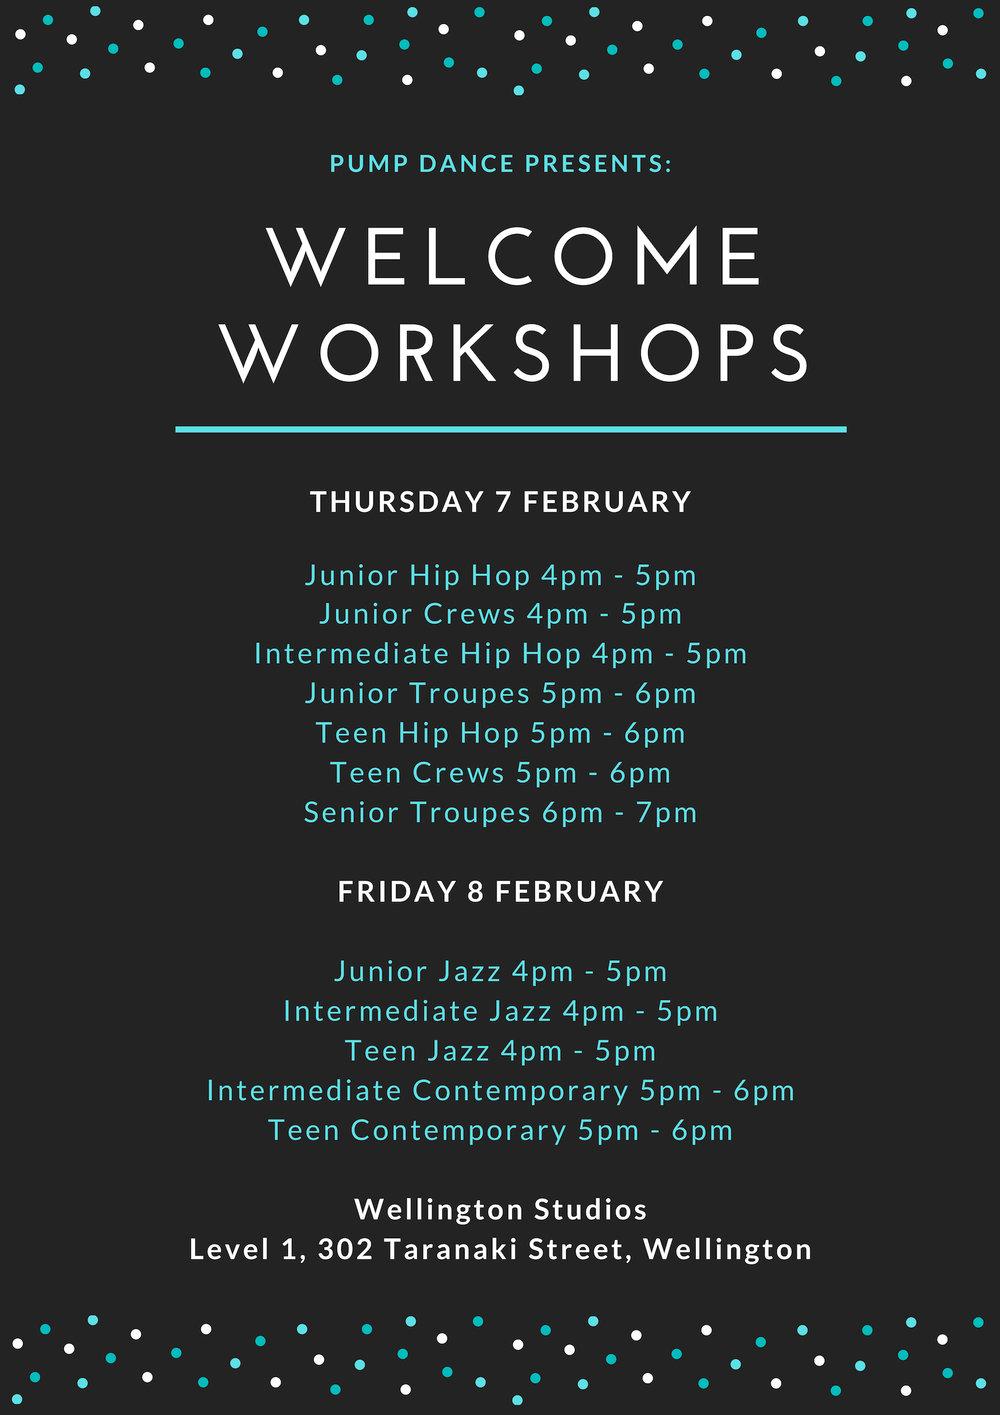 Pump Dance Wellington Welcome Workshops 2019